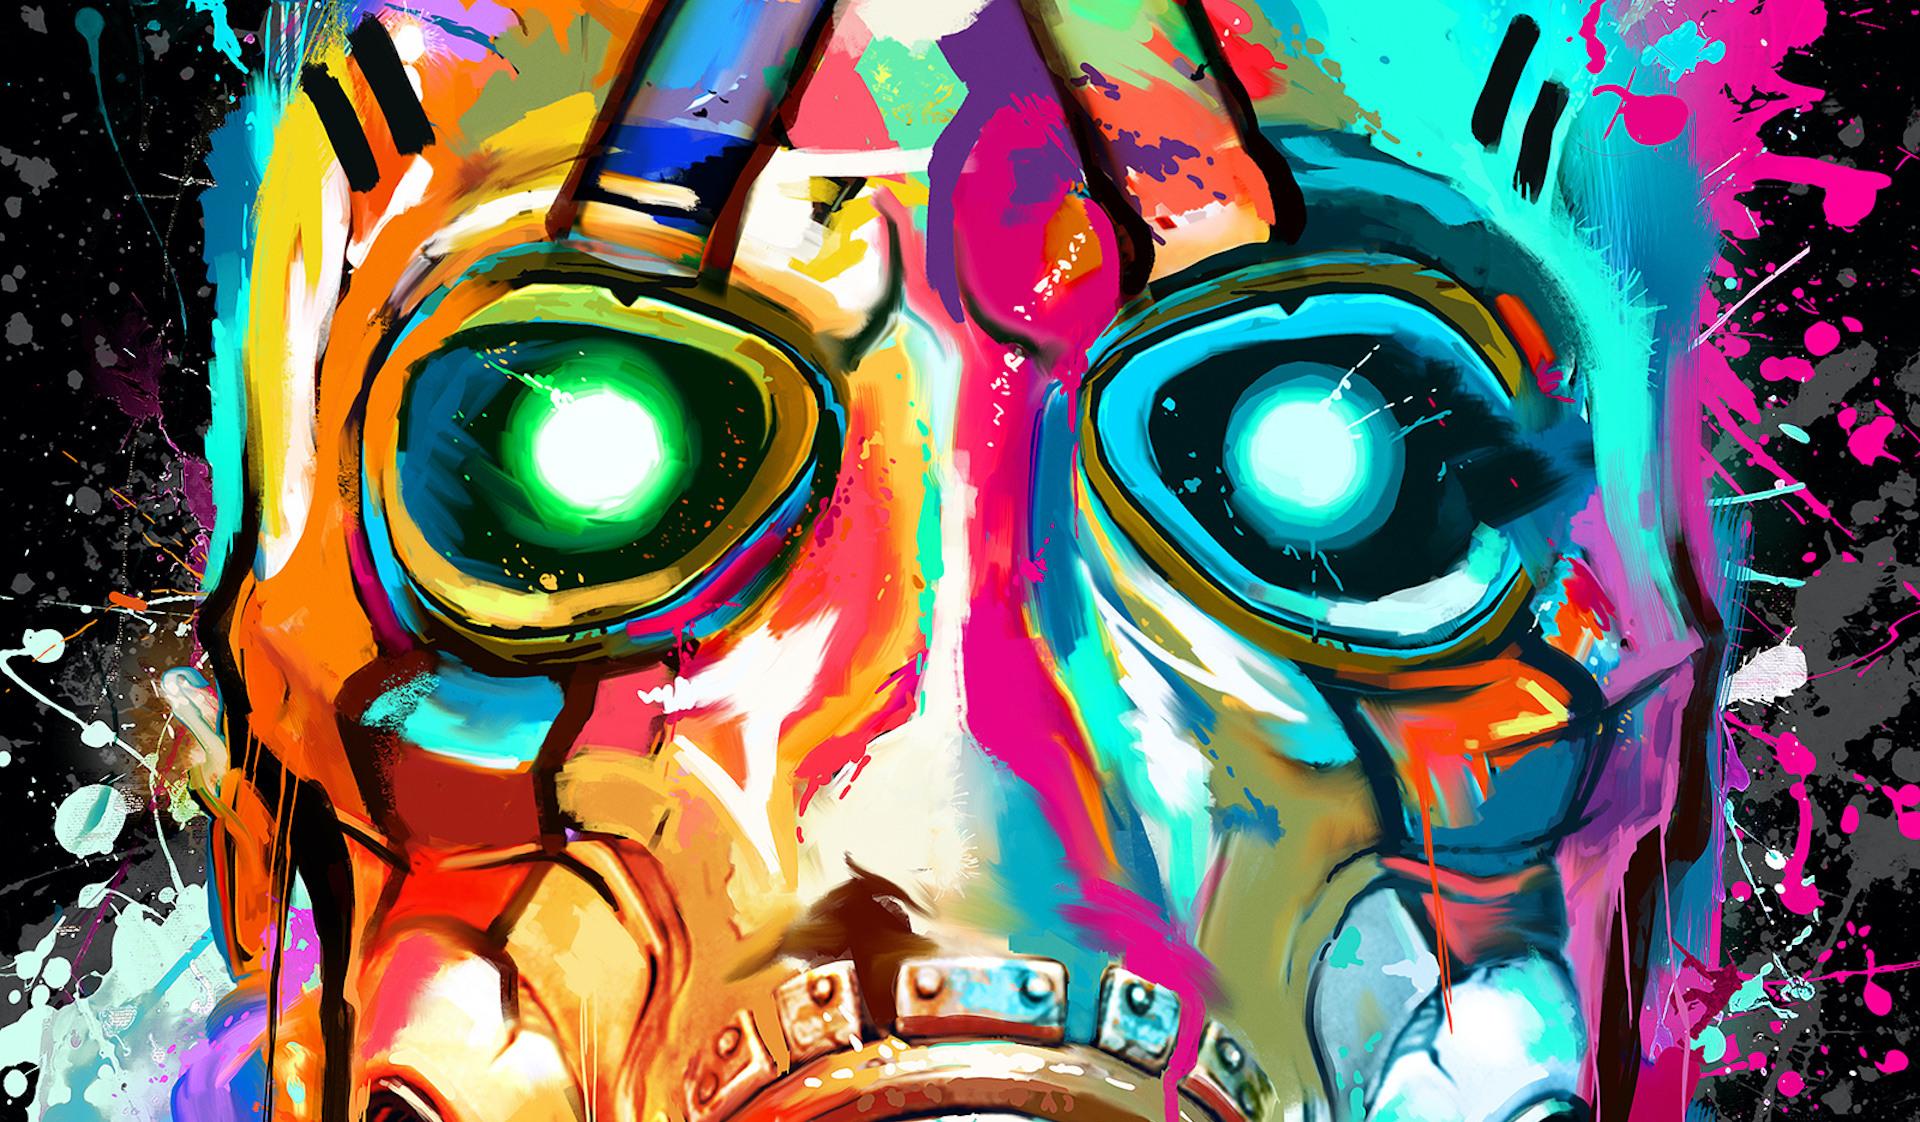 Graffiti Psycho Bandit (detail)